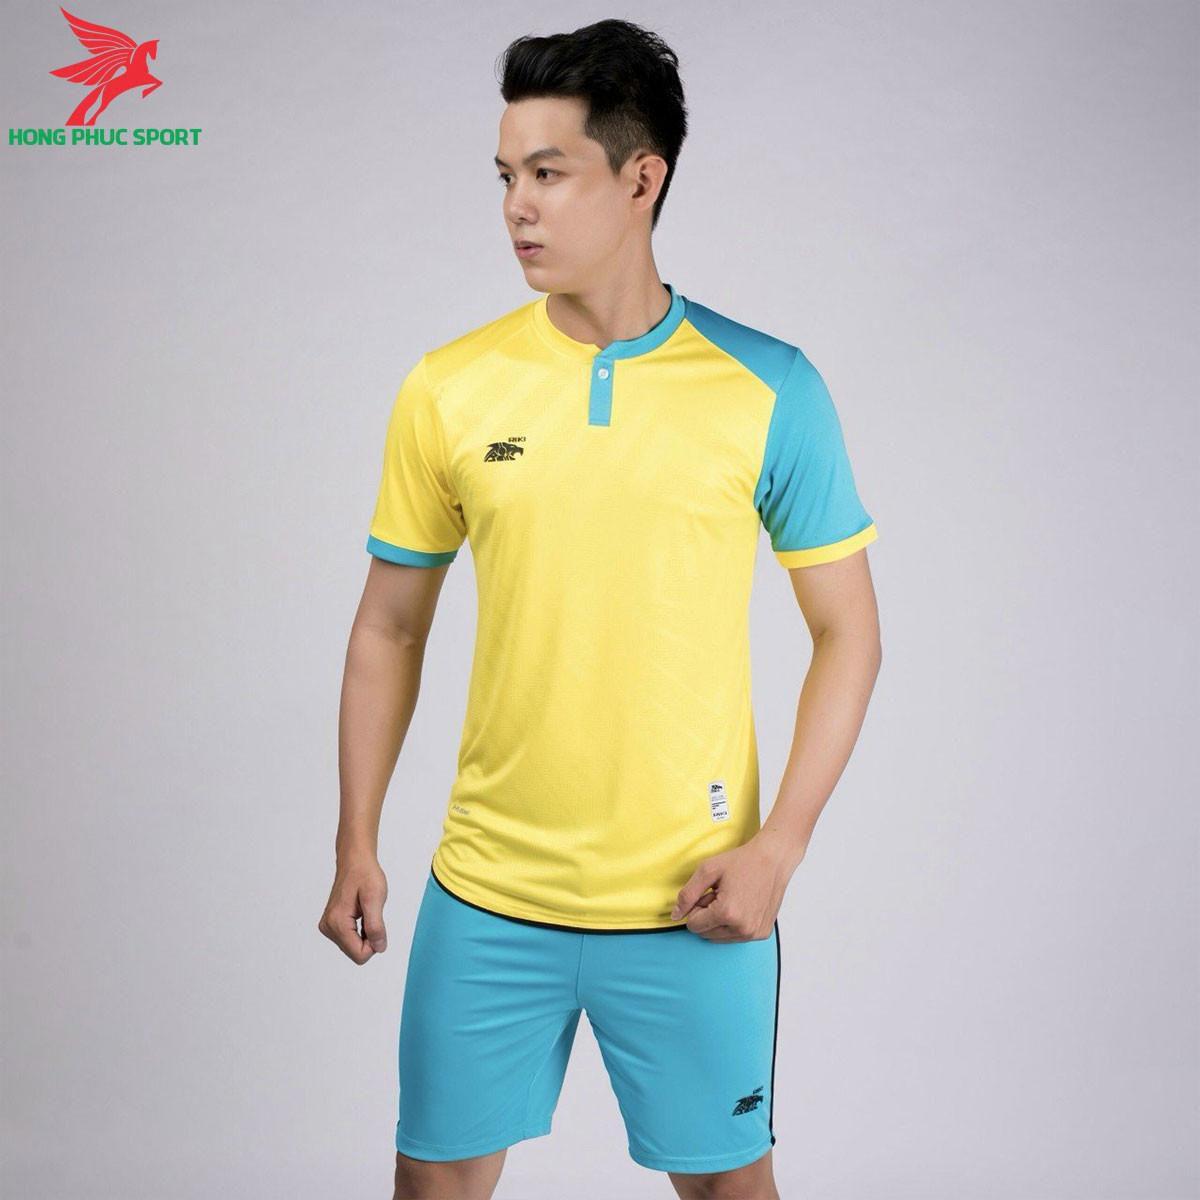 https://cdn.hongphucsport.com/unsafe/s4.shopbay.vn/files/285/ao-khong-logo-riki-lostoran-mau-vang-603e0d8f8a484.jpg